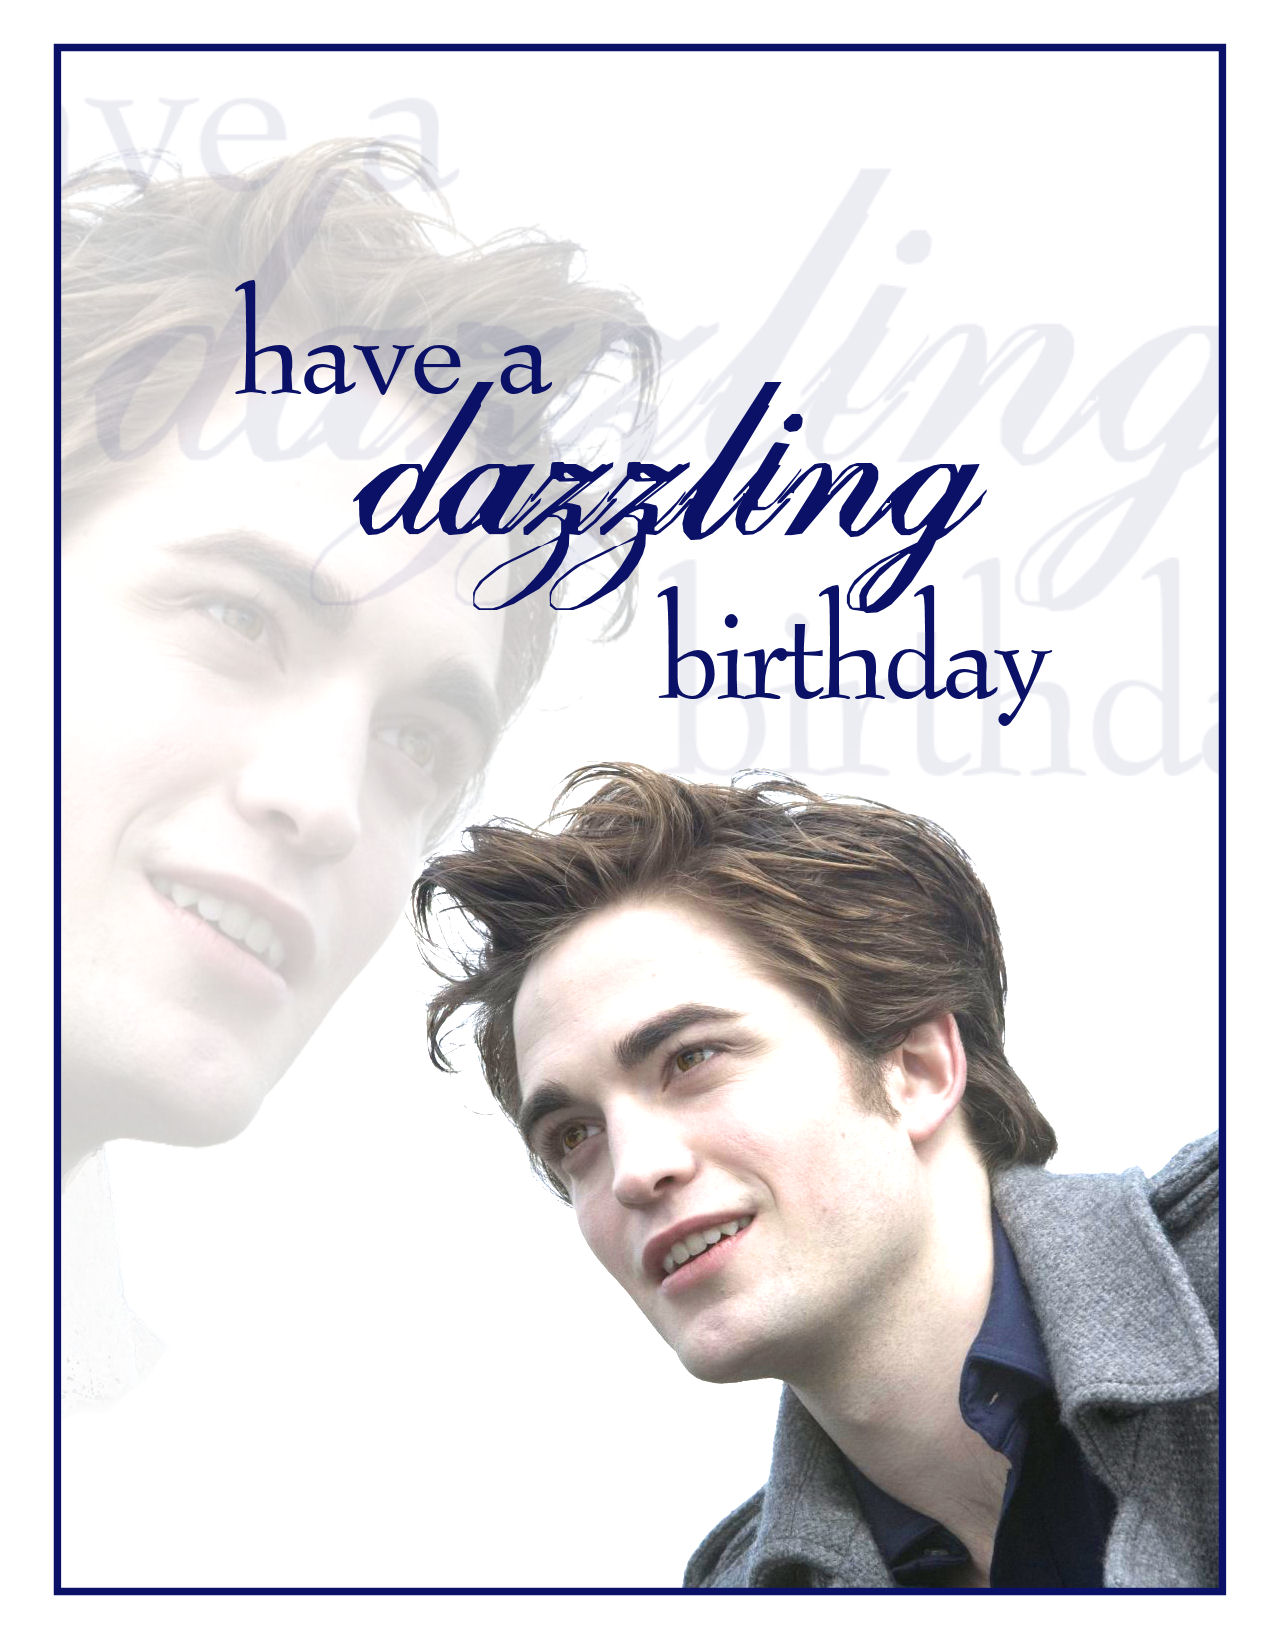 dazzling-birthday1.jpg